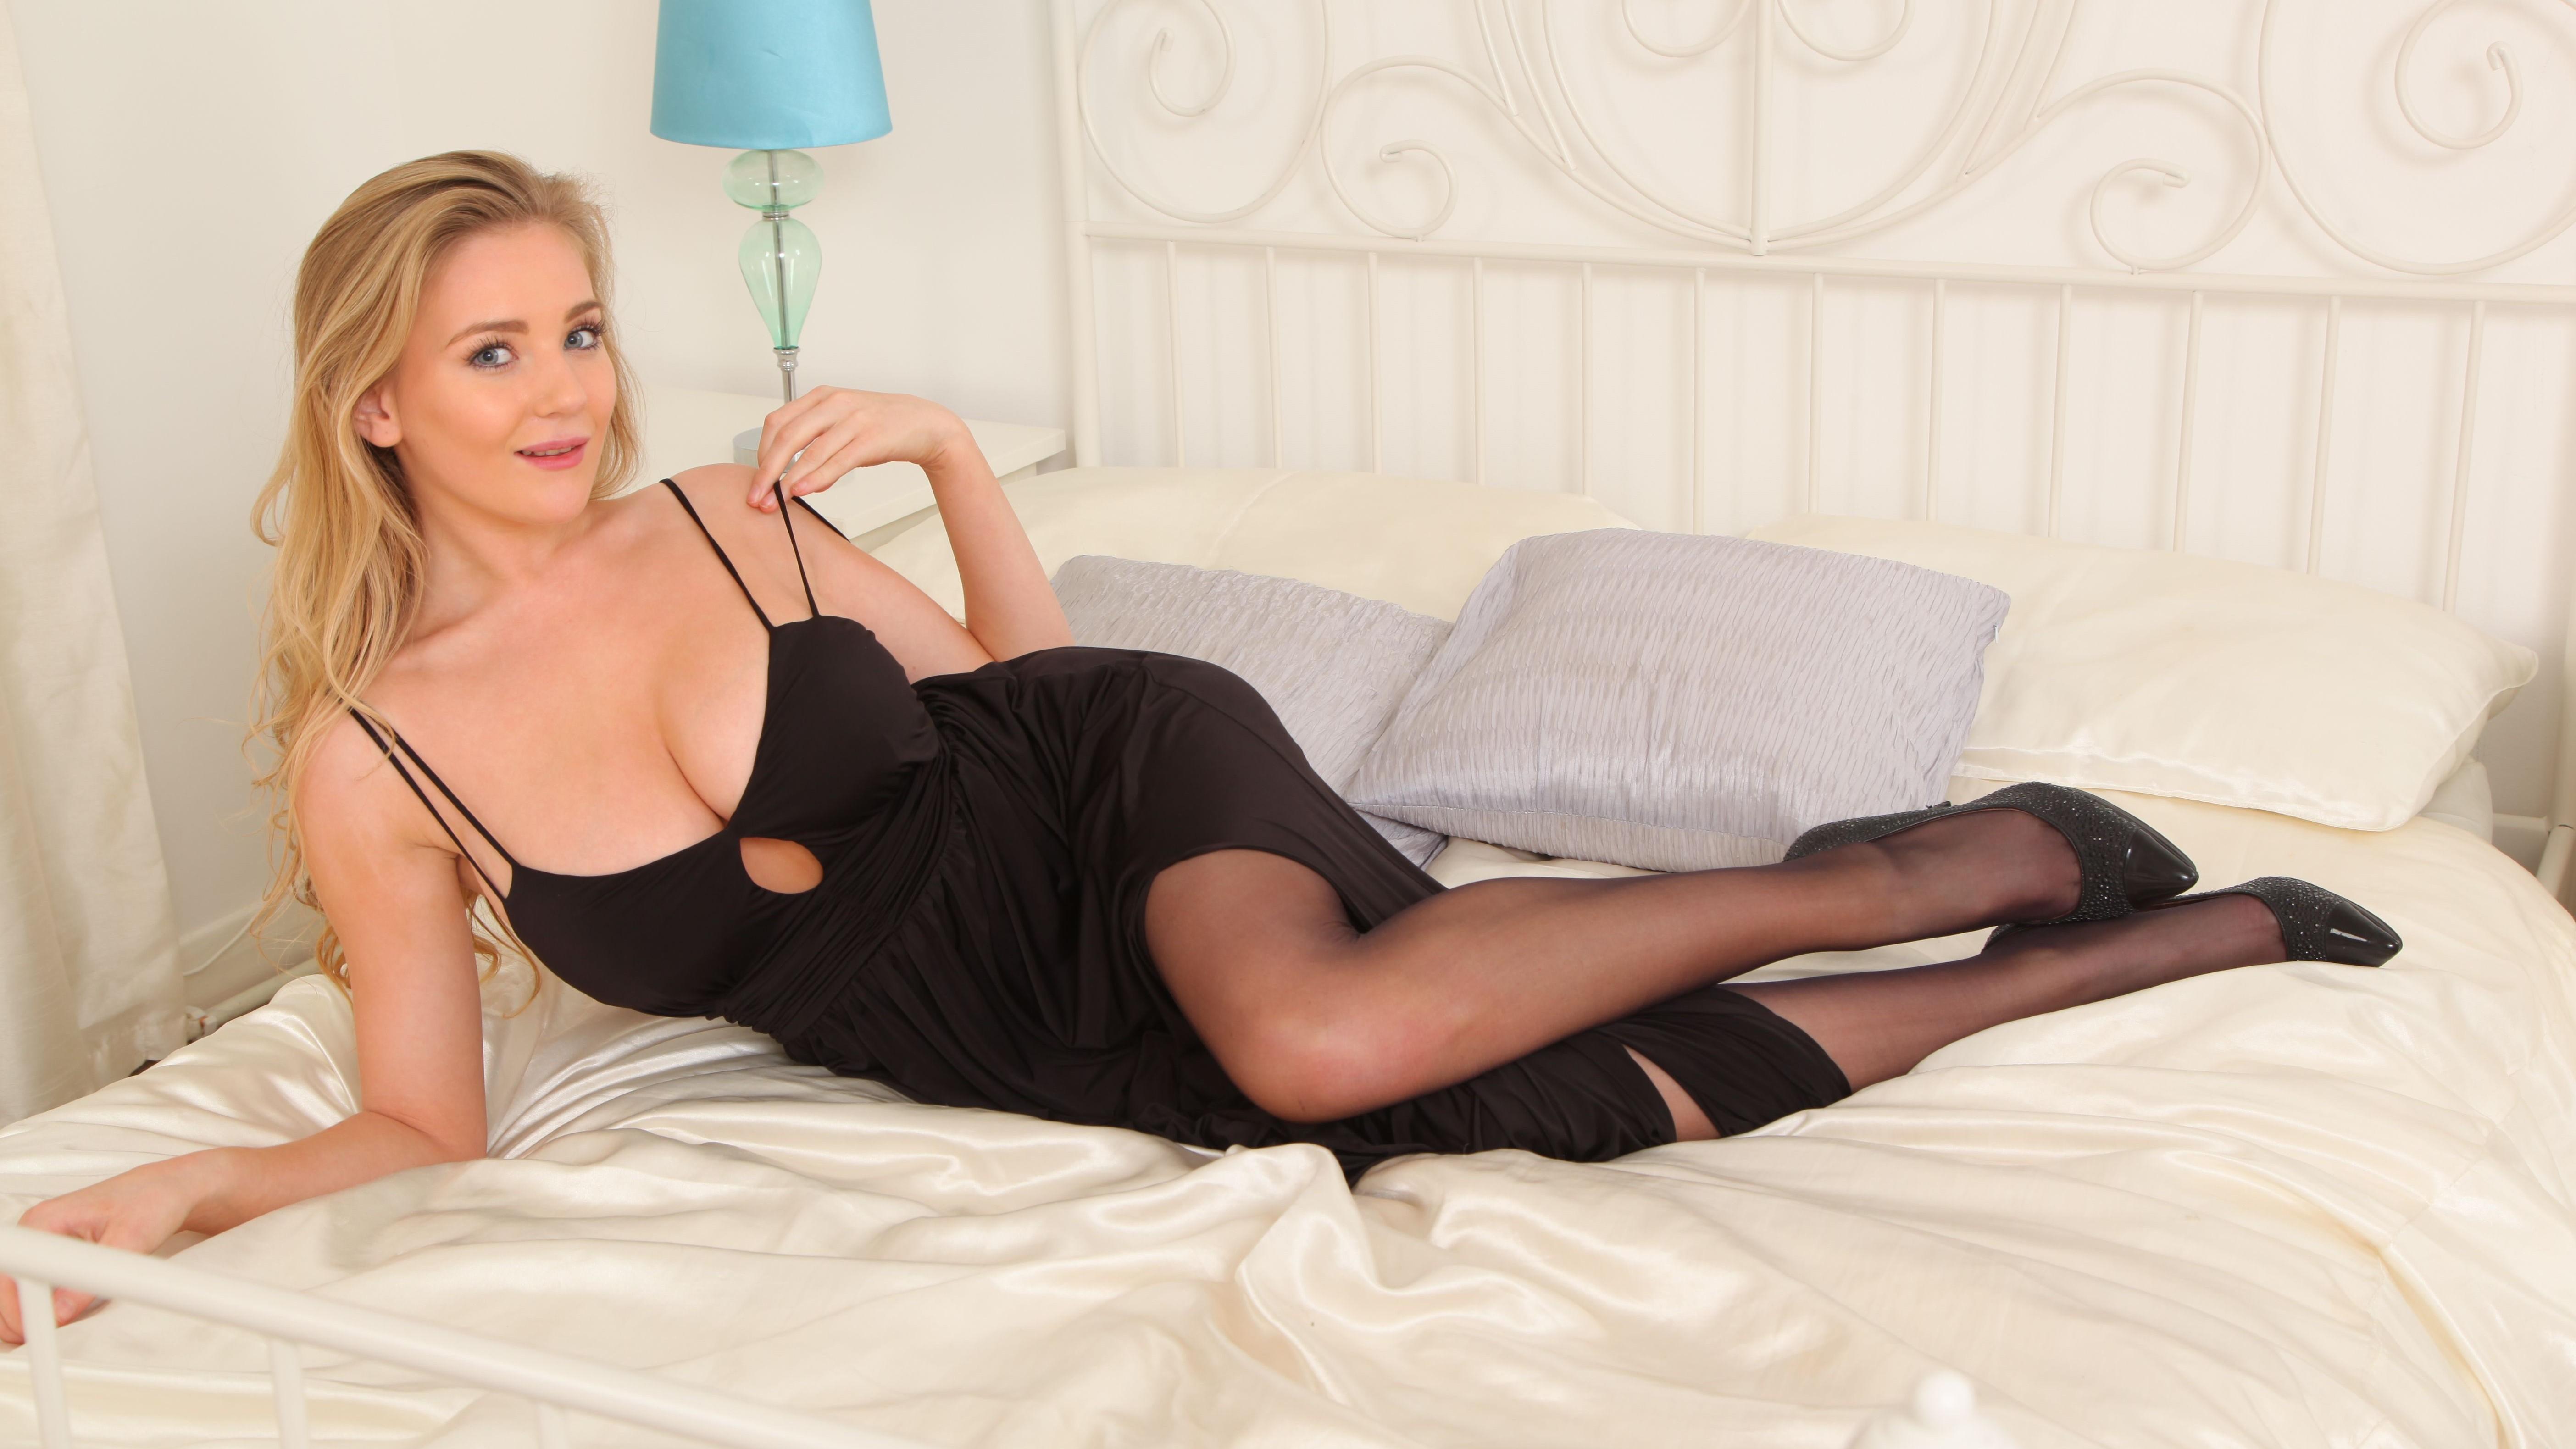 Playboy nude girls of las vegas